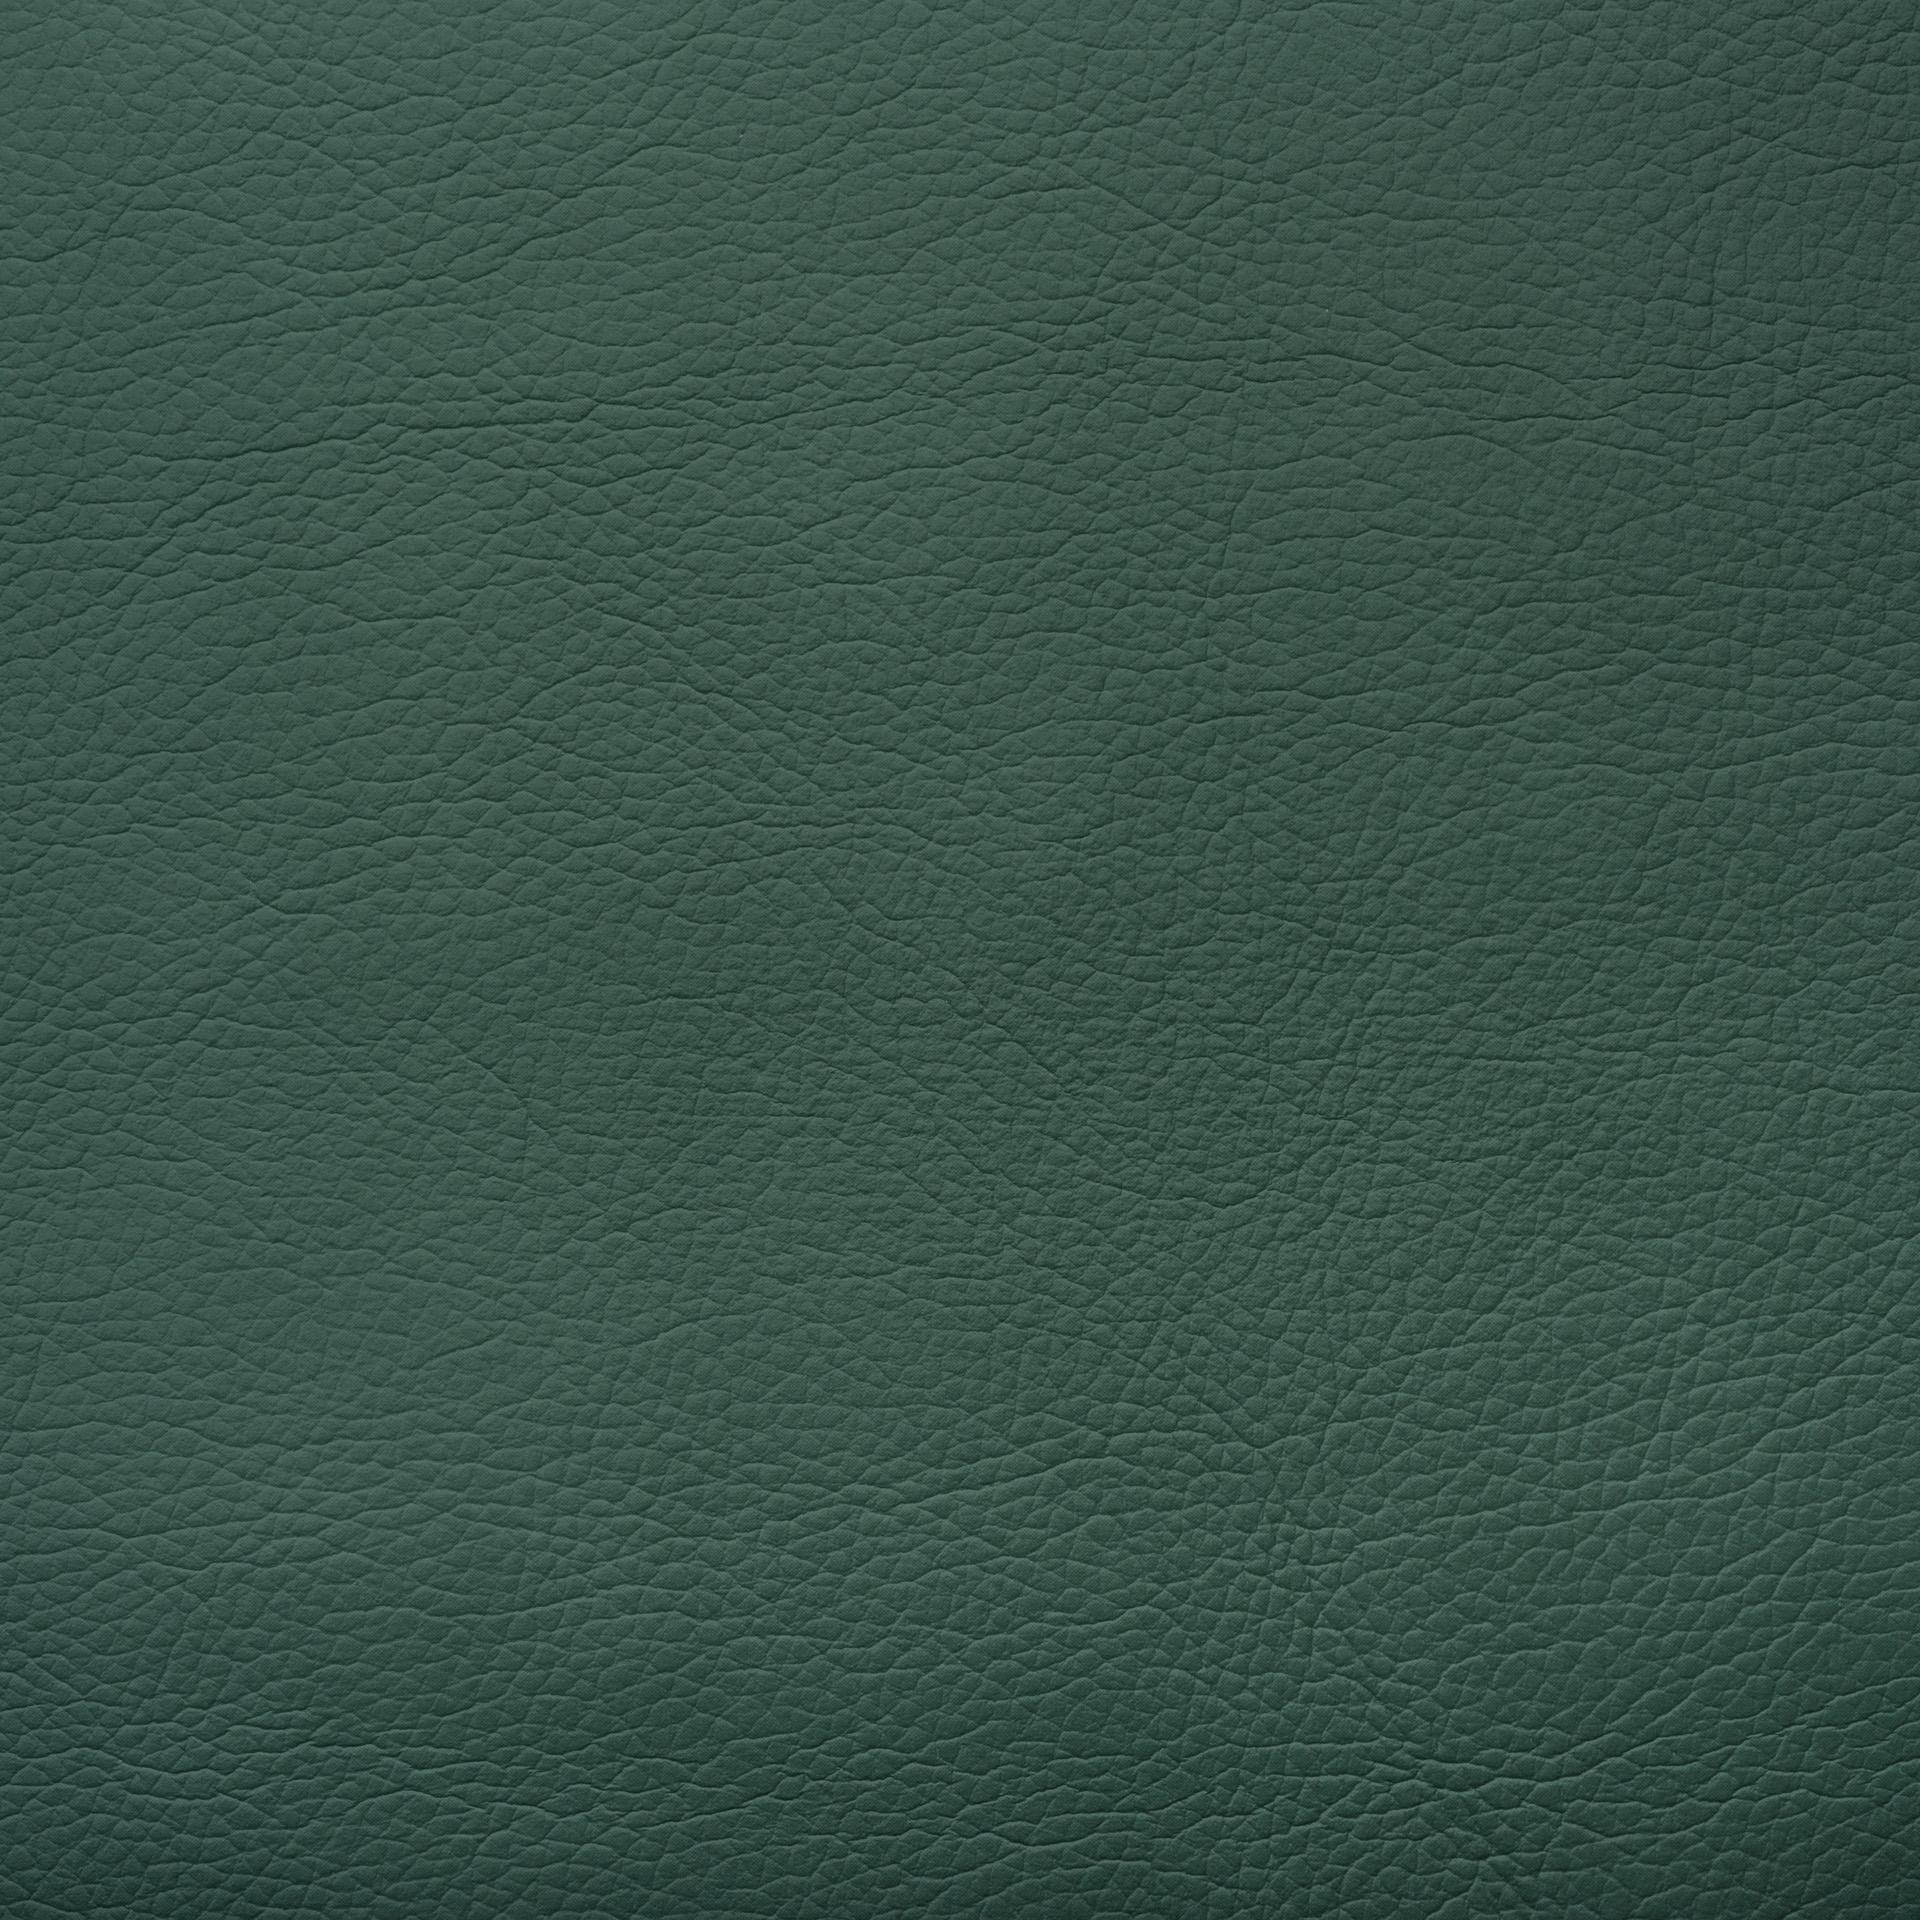 Коллекция ткани Леонардо Каппеллини 08 FROZEN LAKE,  купить ткань Кож зам для мебели Украина